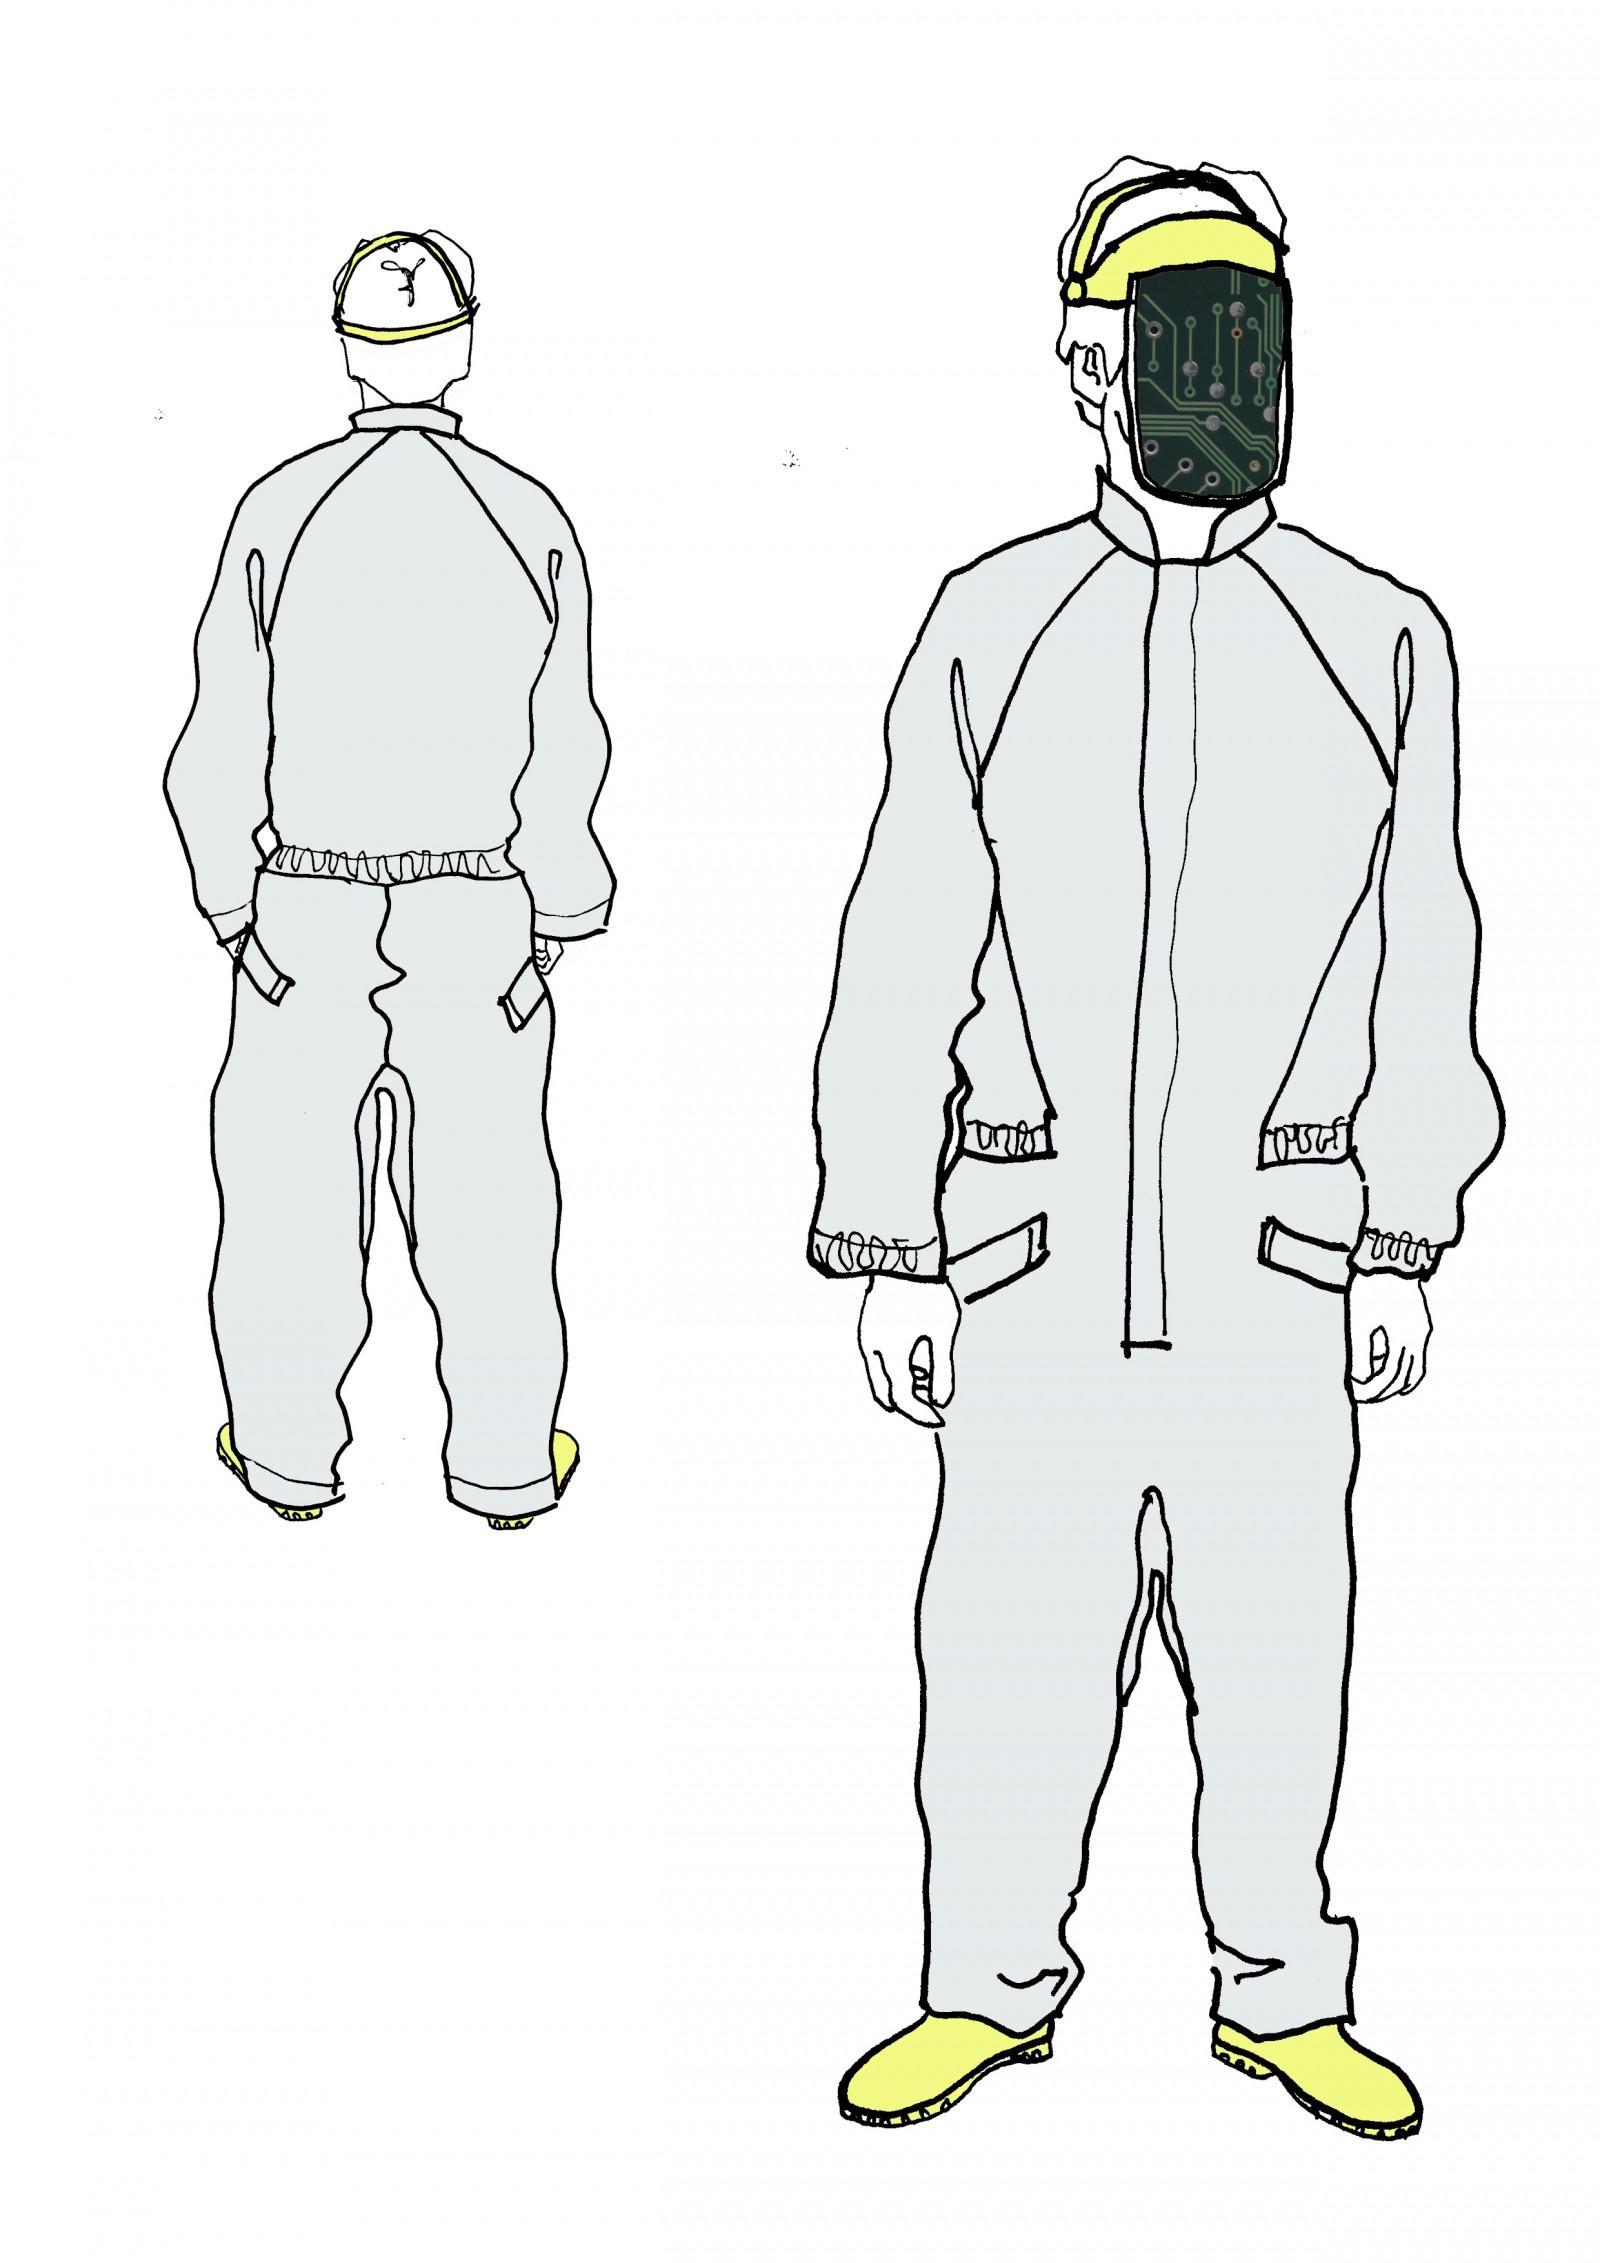 'Science Fashion' Bachelor Project illustration